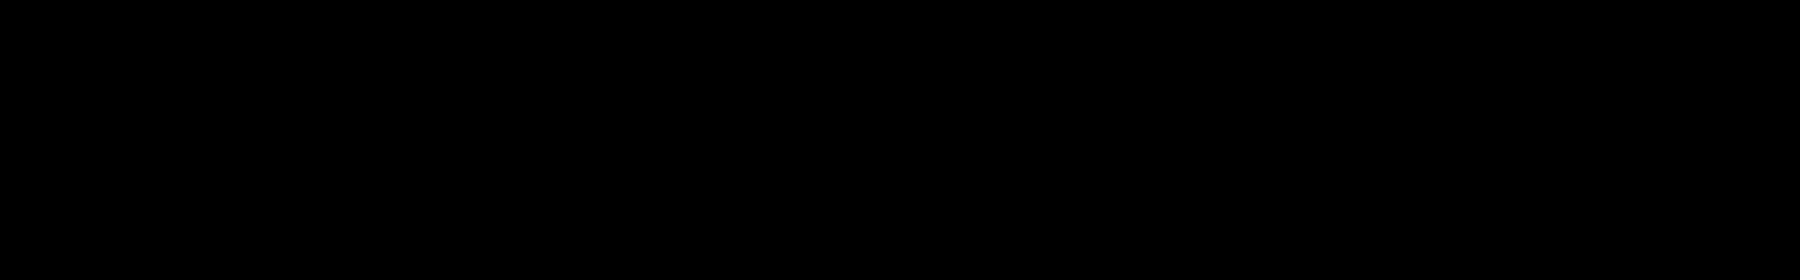 Lo-Fi Loops audio waveform